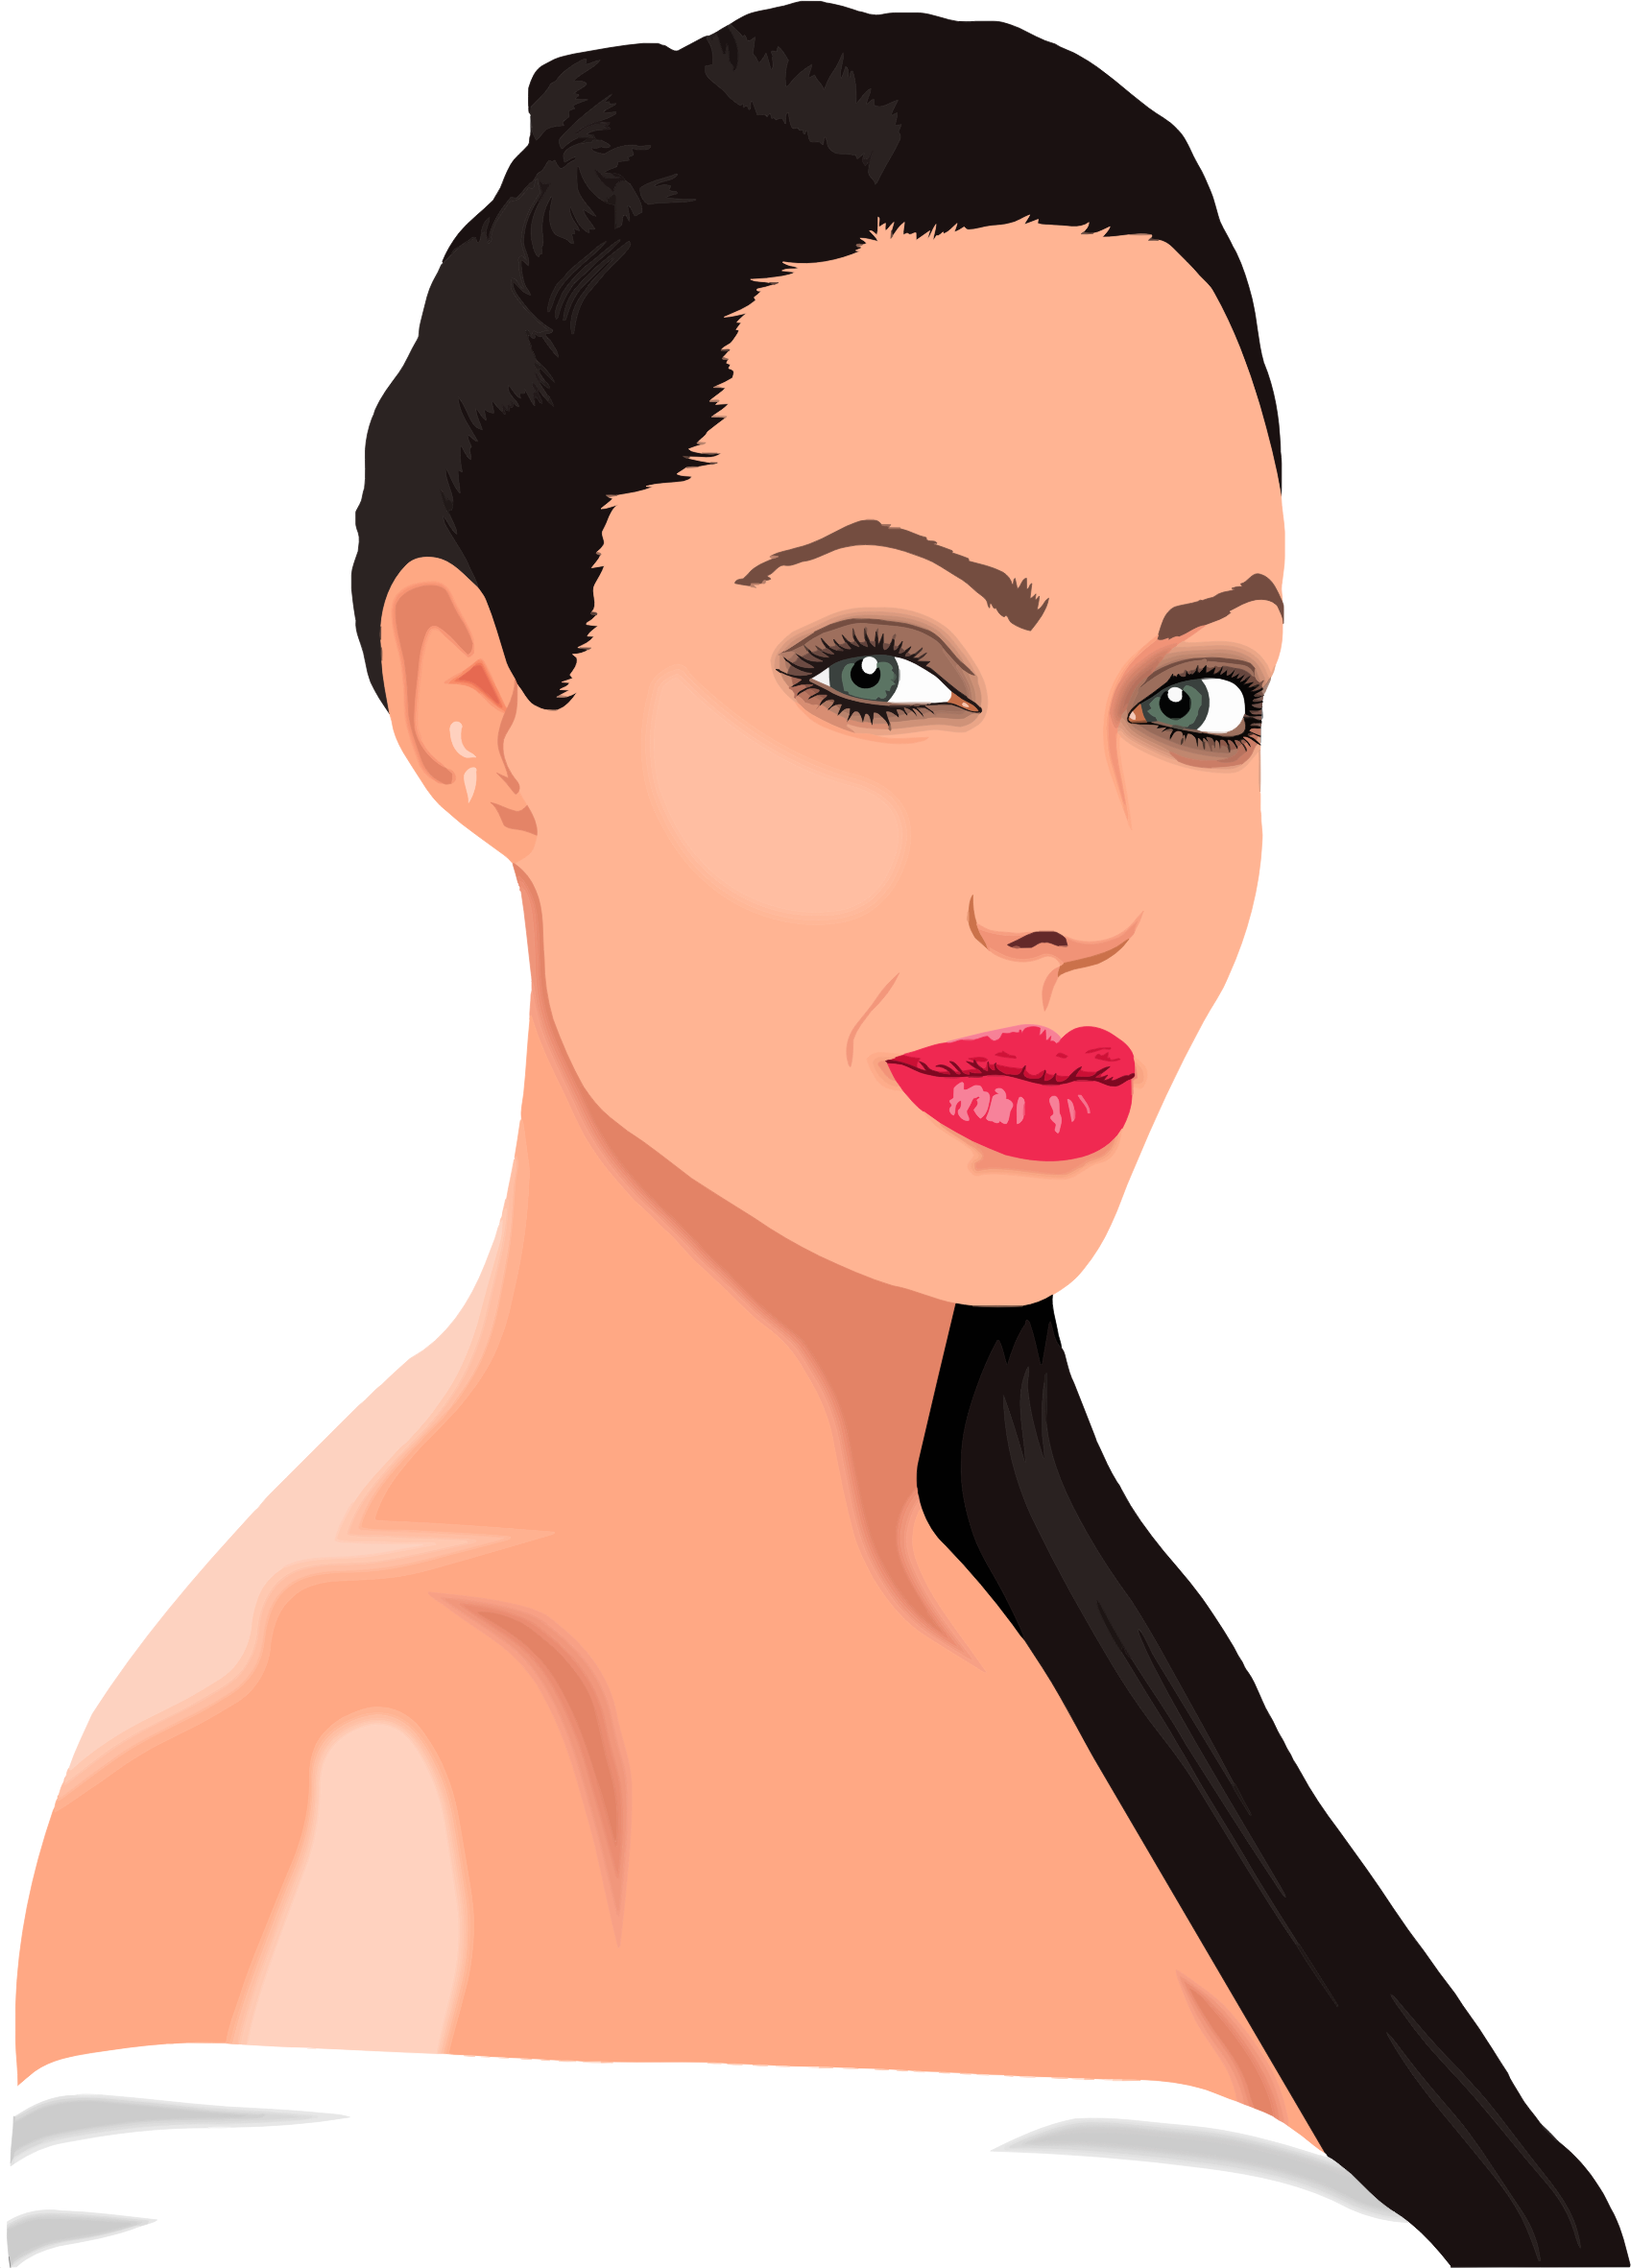 Portrait clipart #2, Download drawings